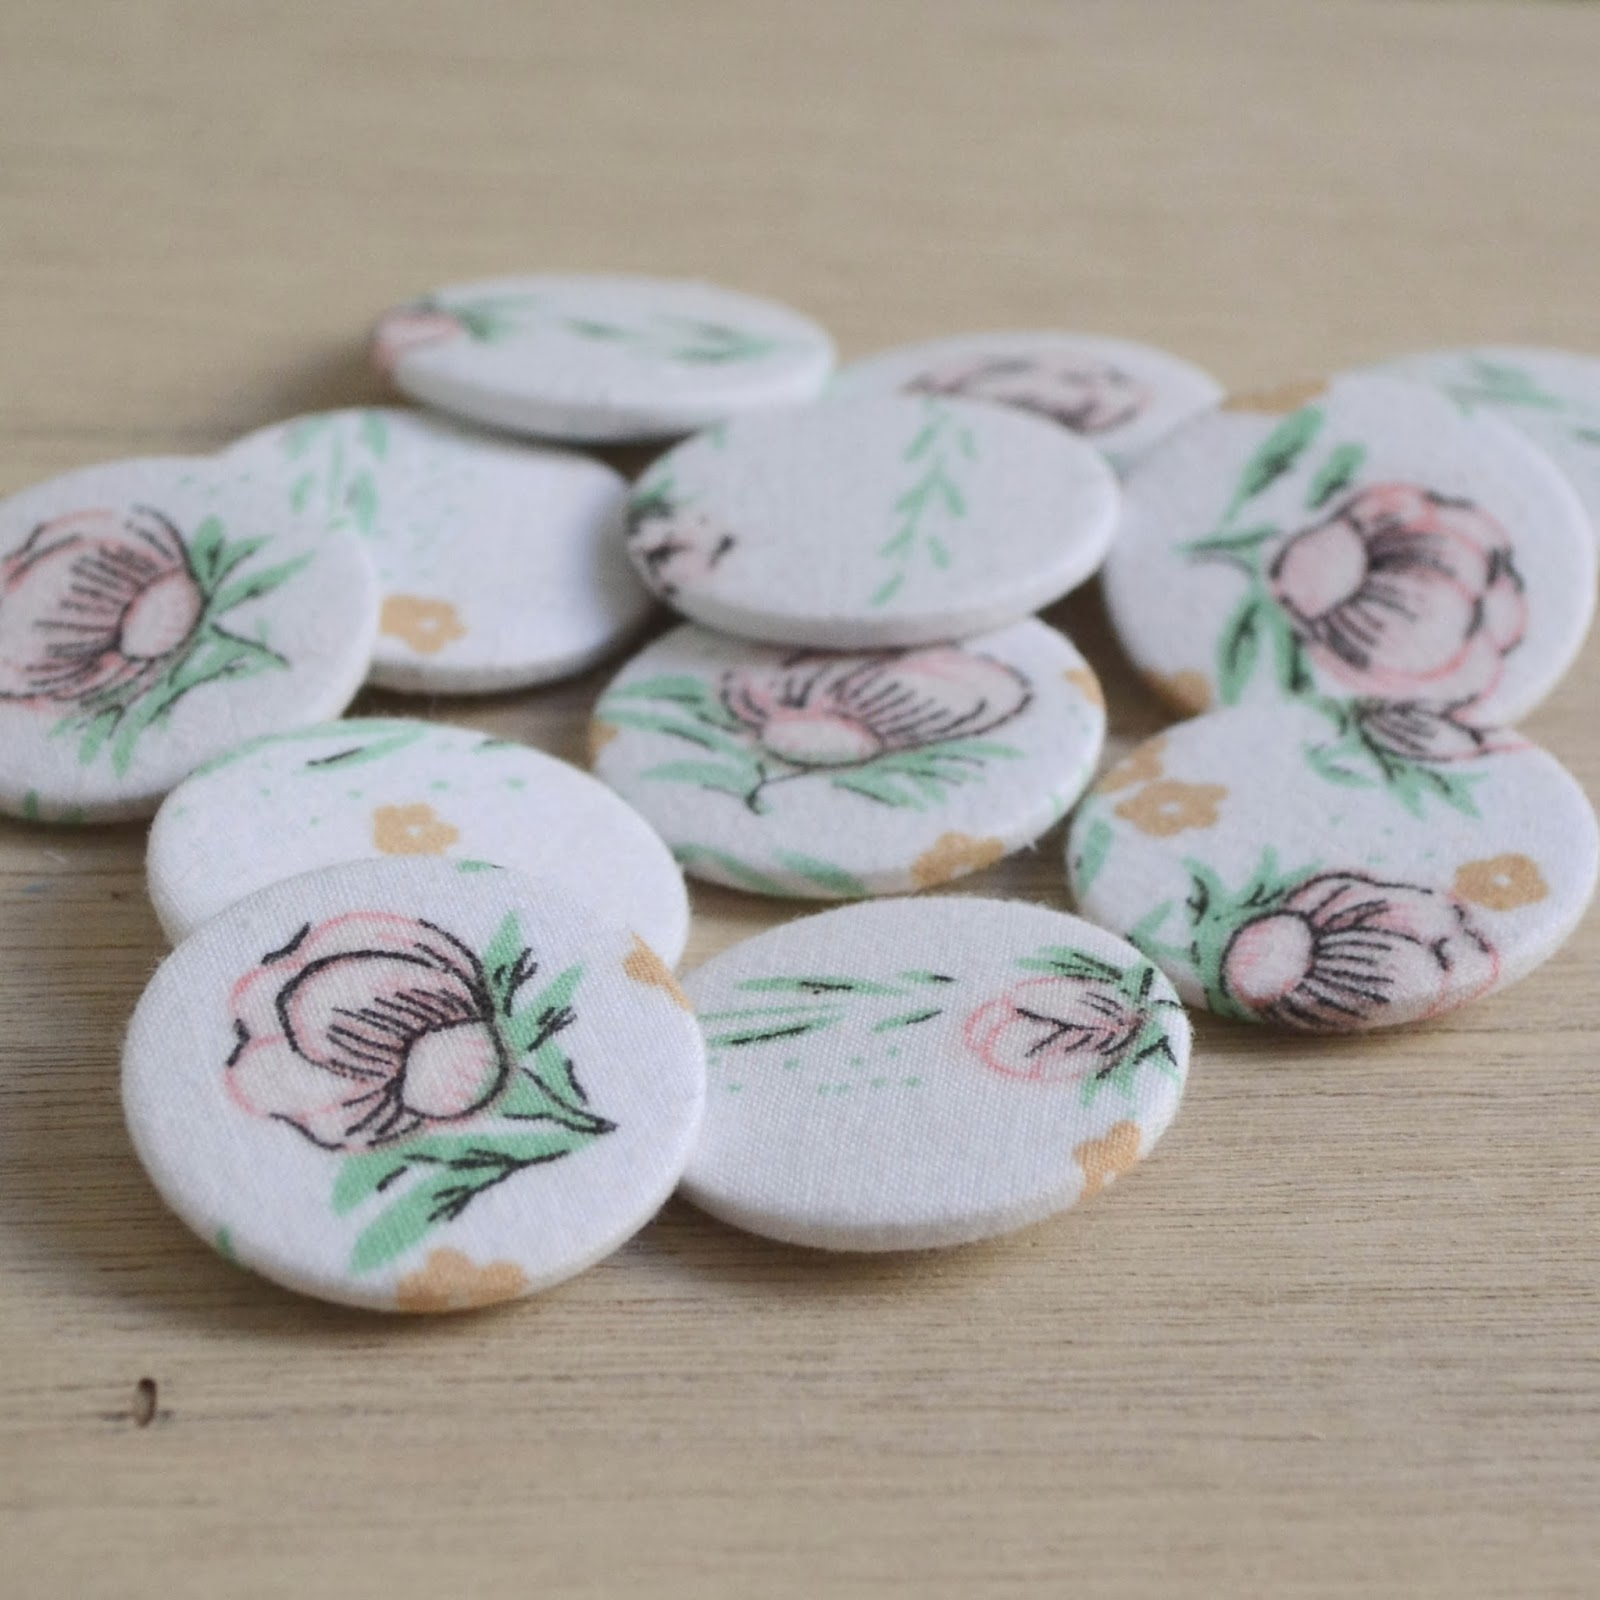 https://www.etsy.com/listing/175723298/pretty-vintage-floral-fabric-badges?ref=shop_home_active_3